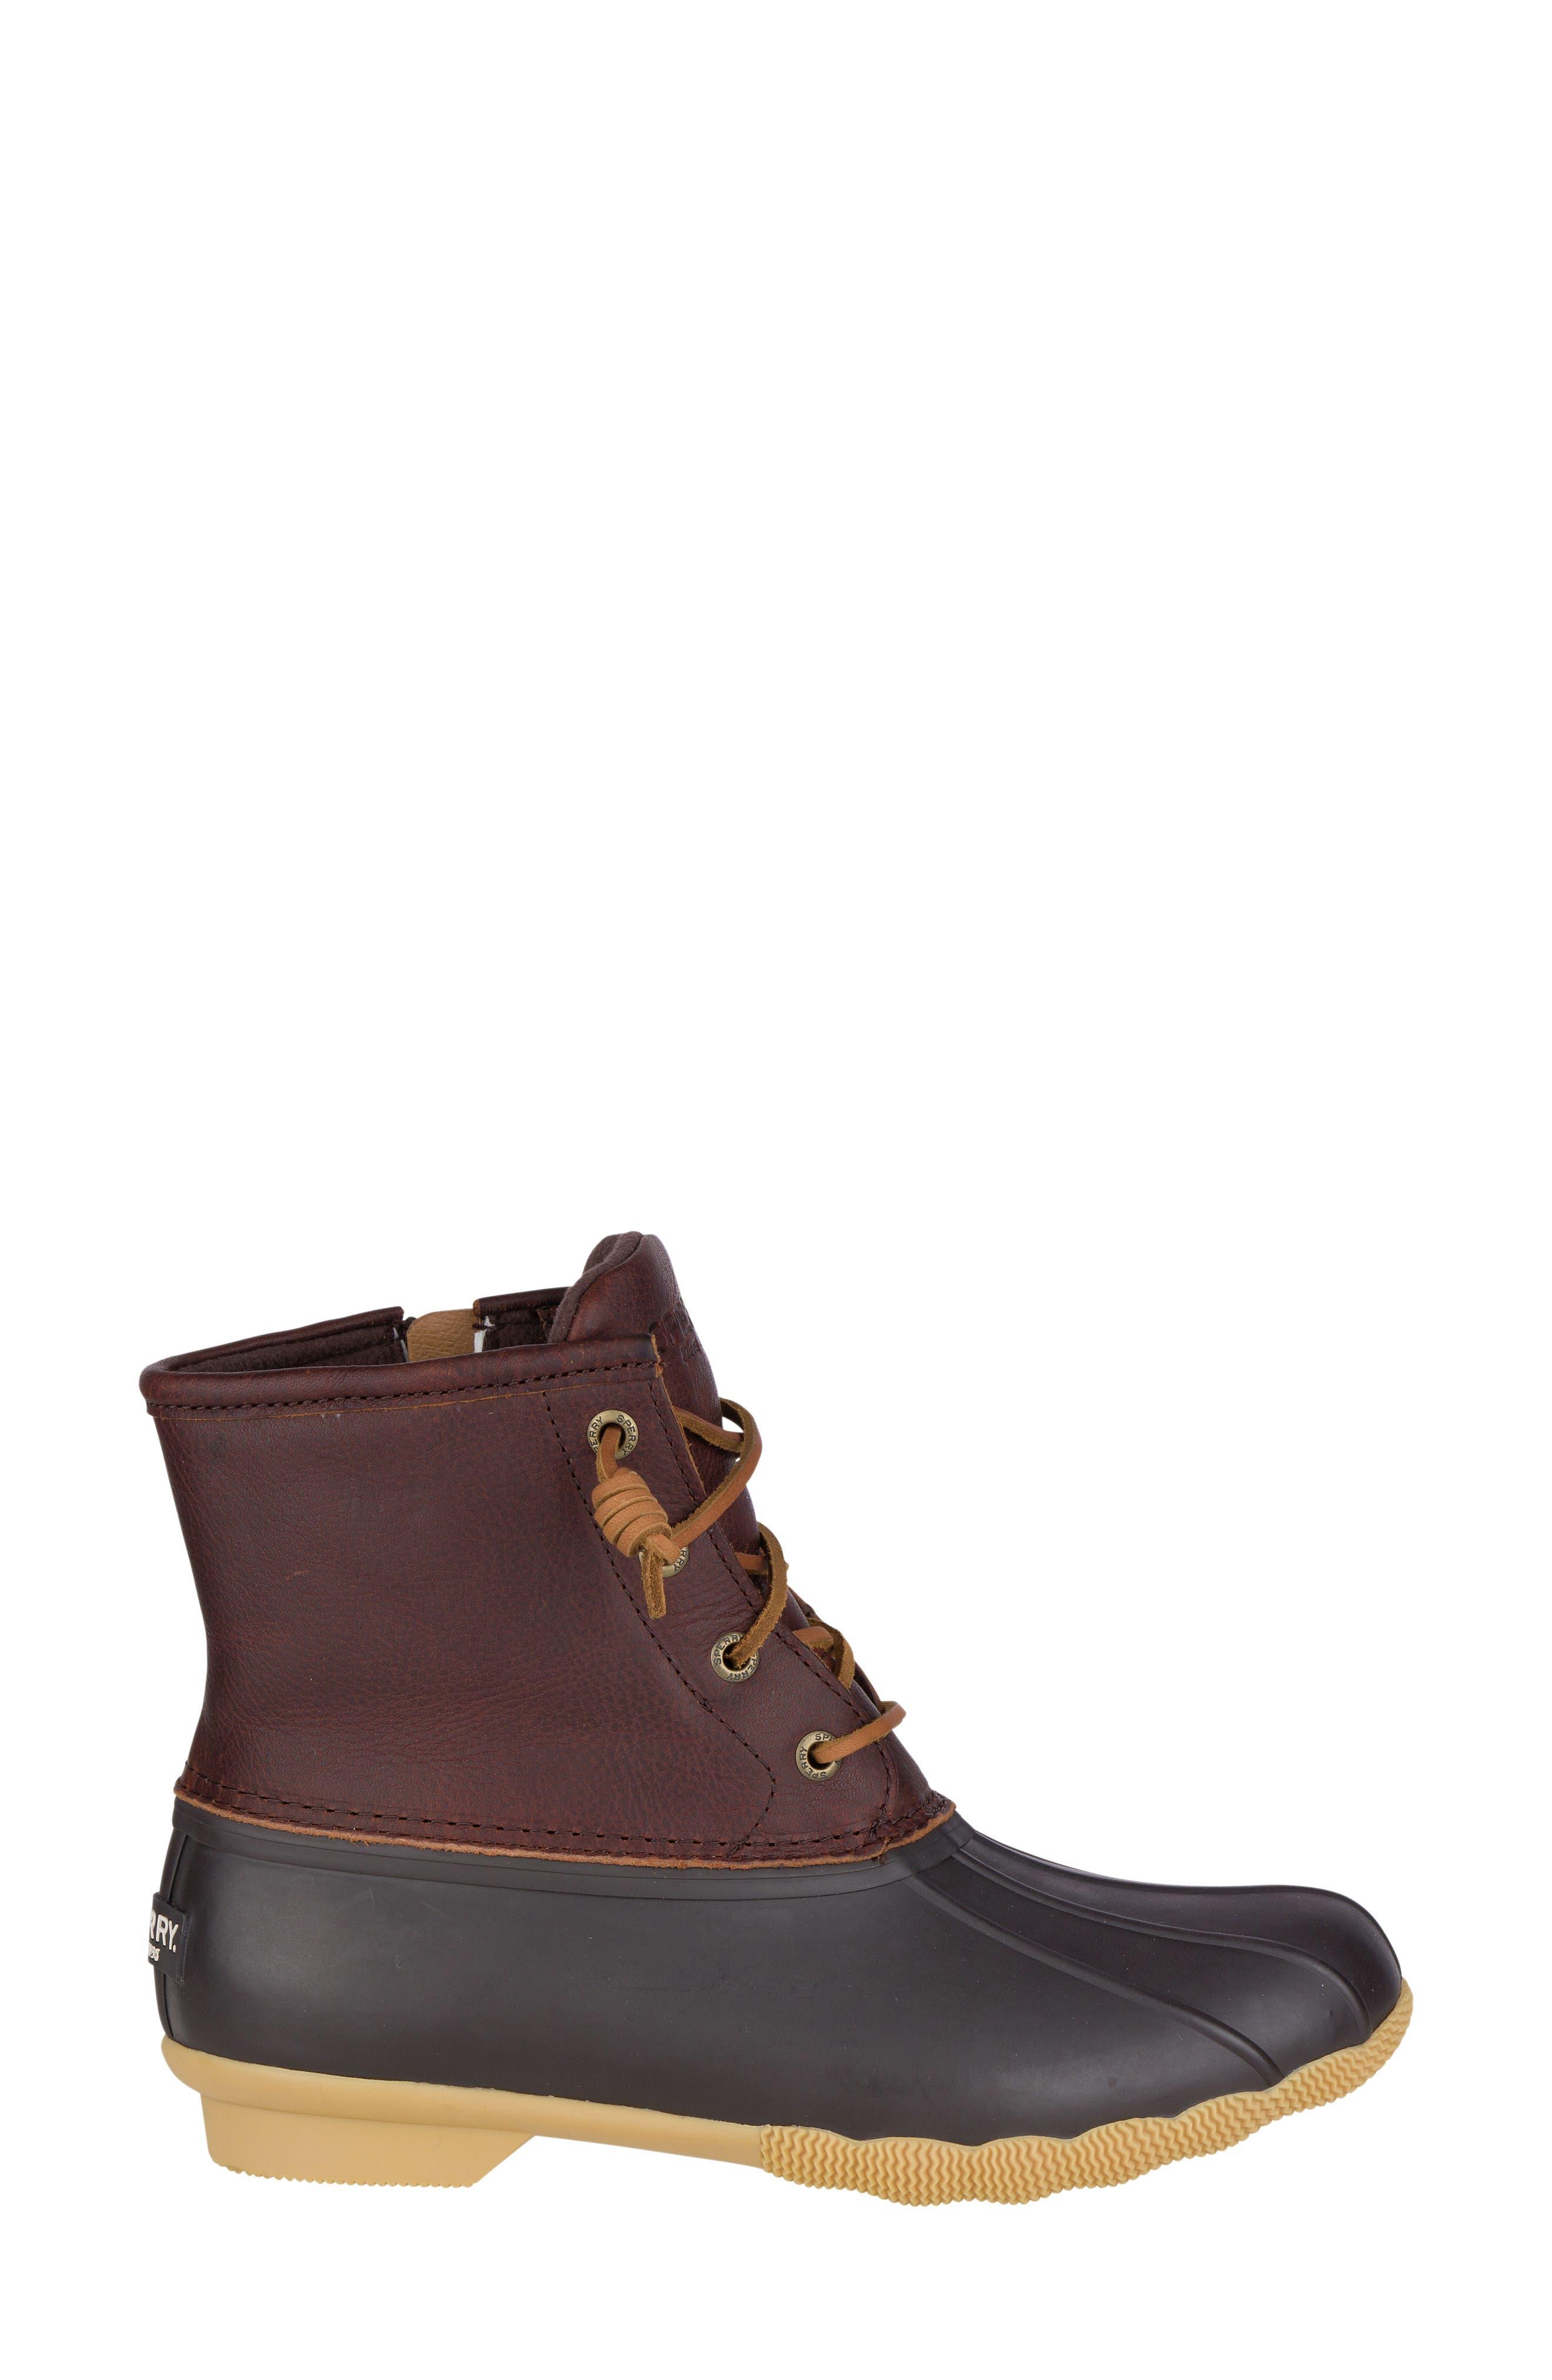 Saltwater Thinsulate<sup>™</sup> Waterproof Rain Boot,                         Main,                         color, Tan/ Brown